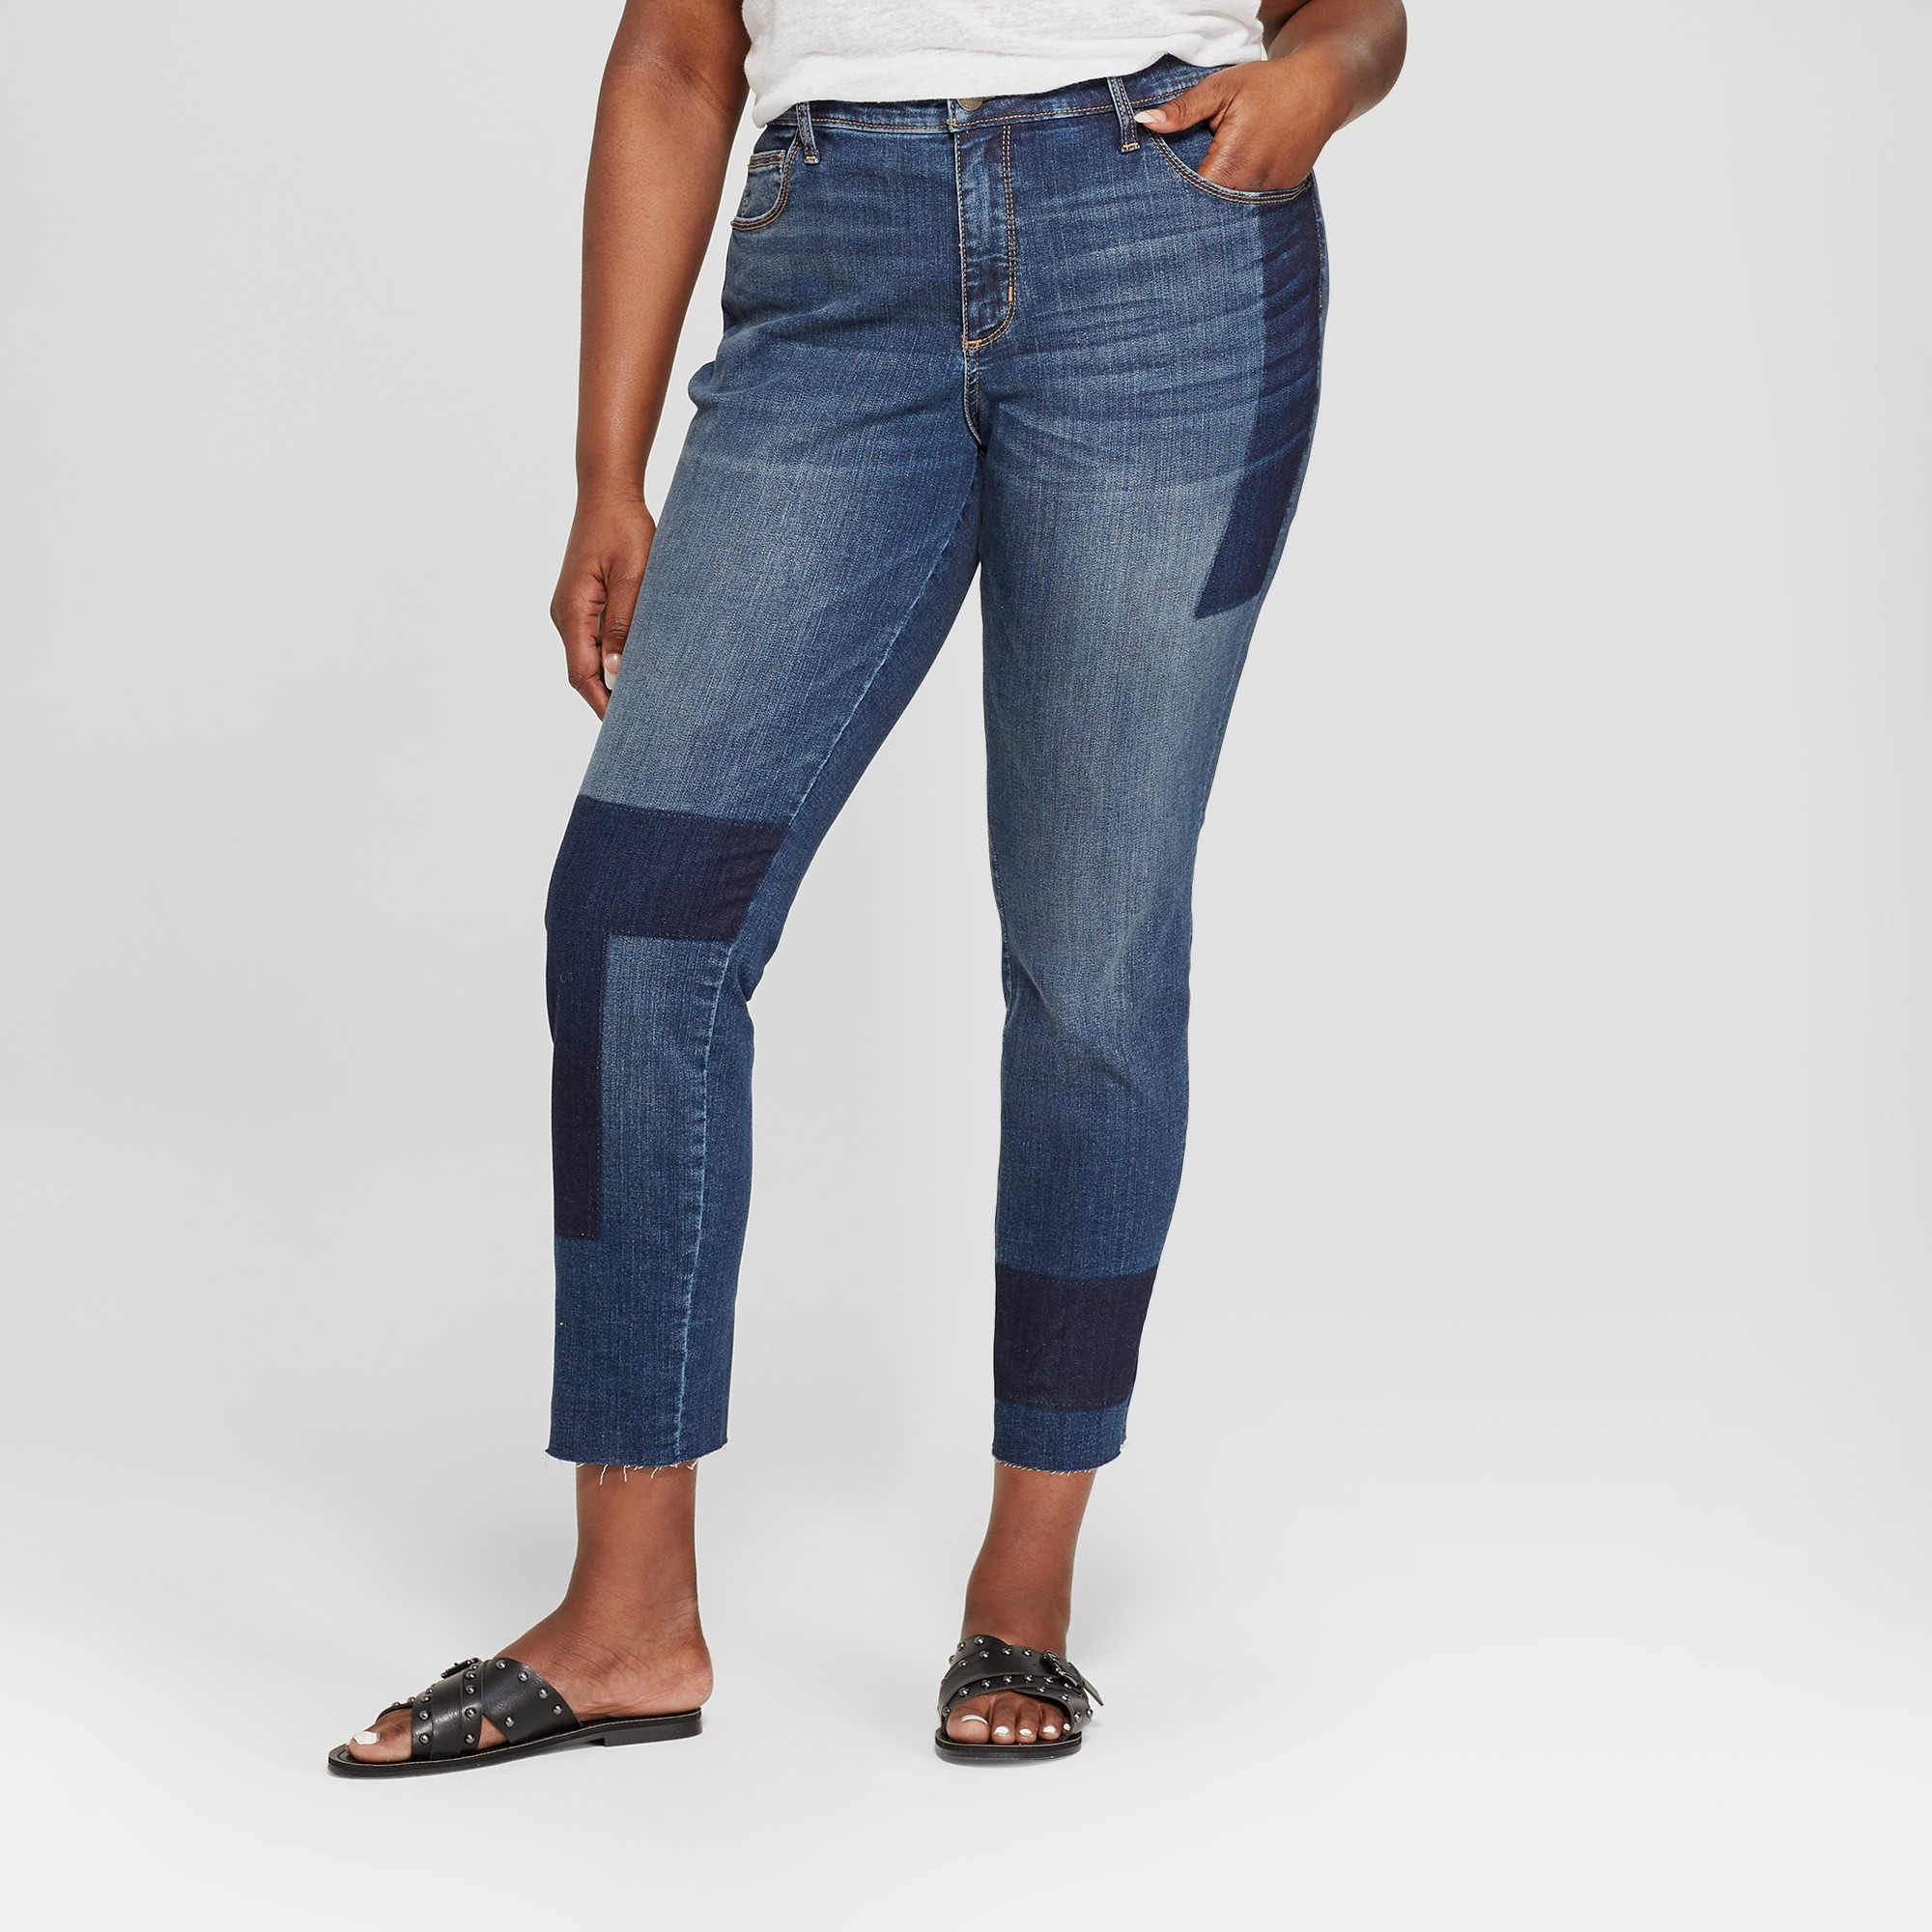 8dc61ecae48 Women s Plus Size Patchwork Skinny Jeans - Universal Thread Dark Wash 26WL